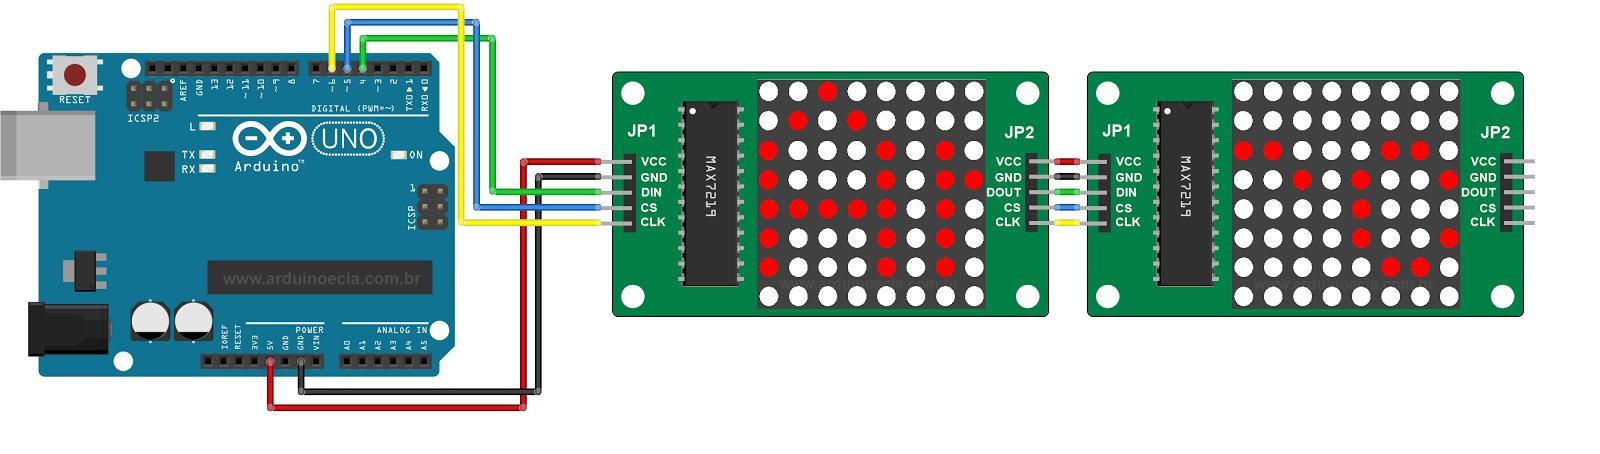 16x16 Dot LED Matrix Display Arduino Hello World